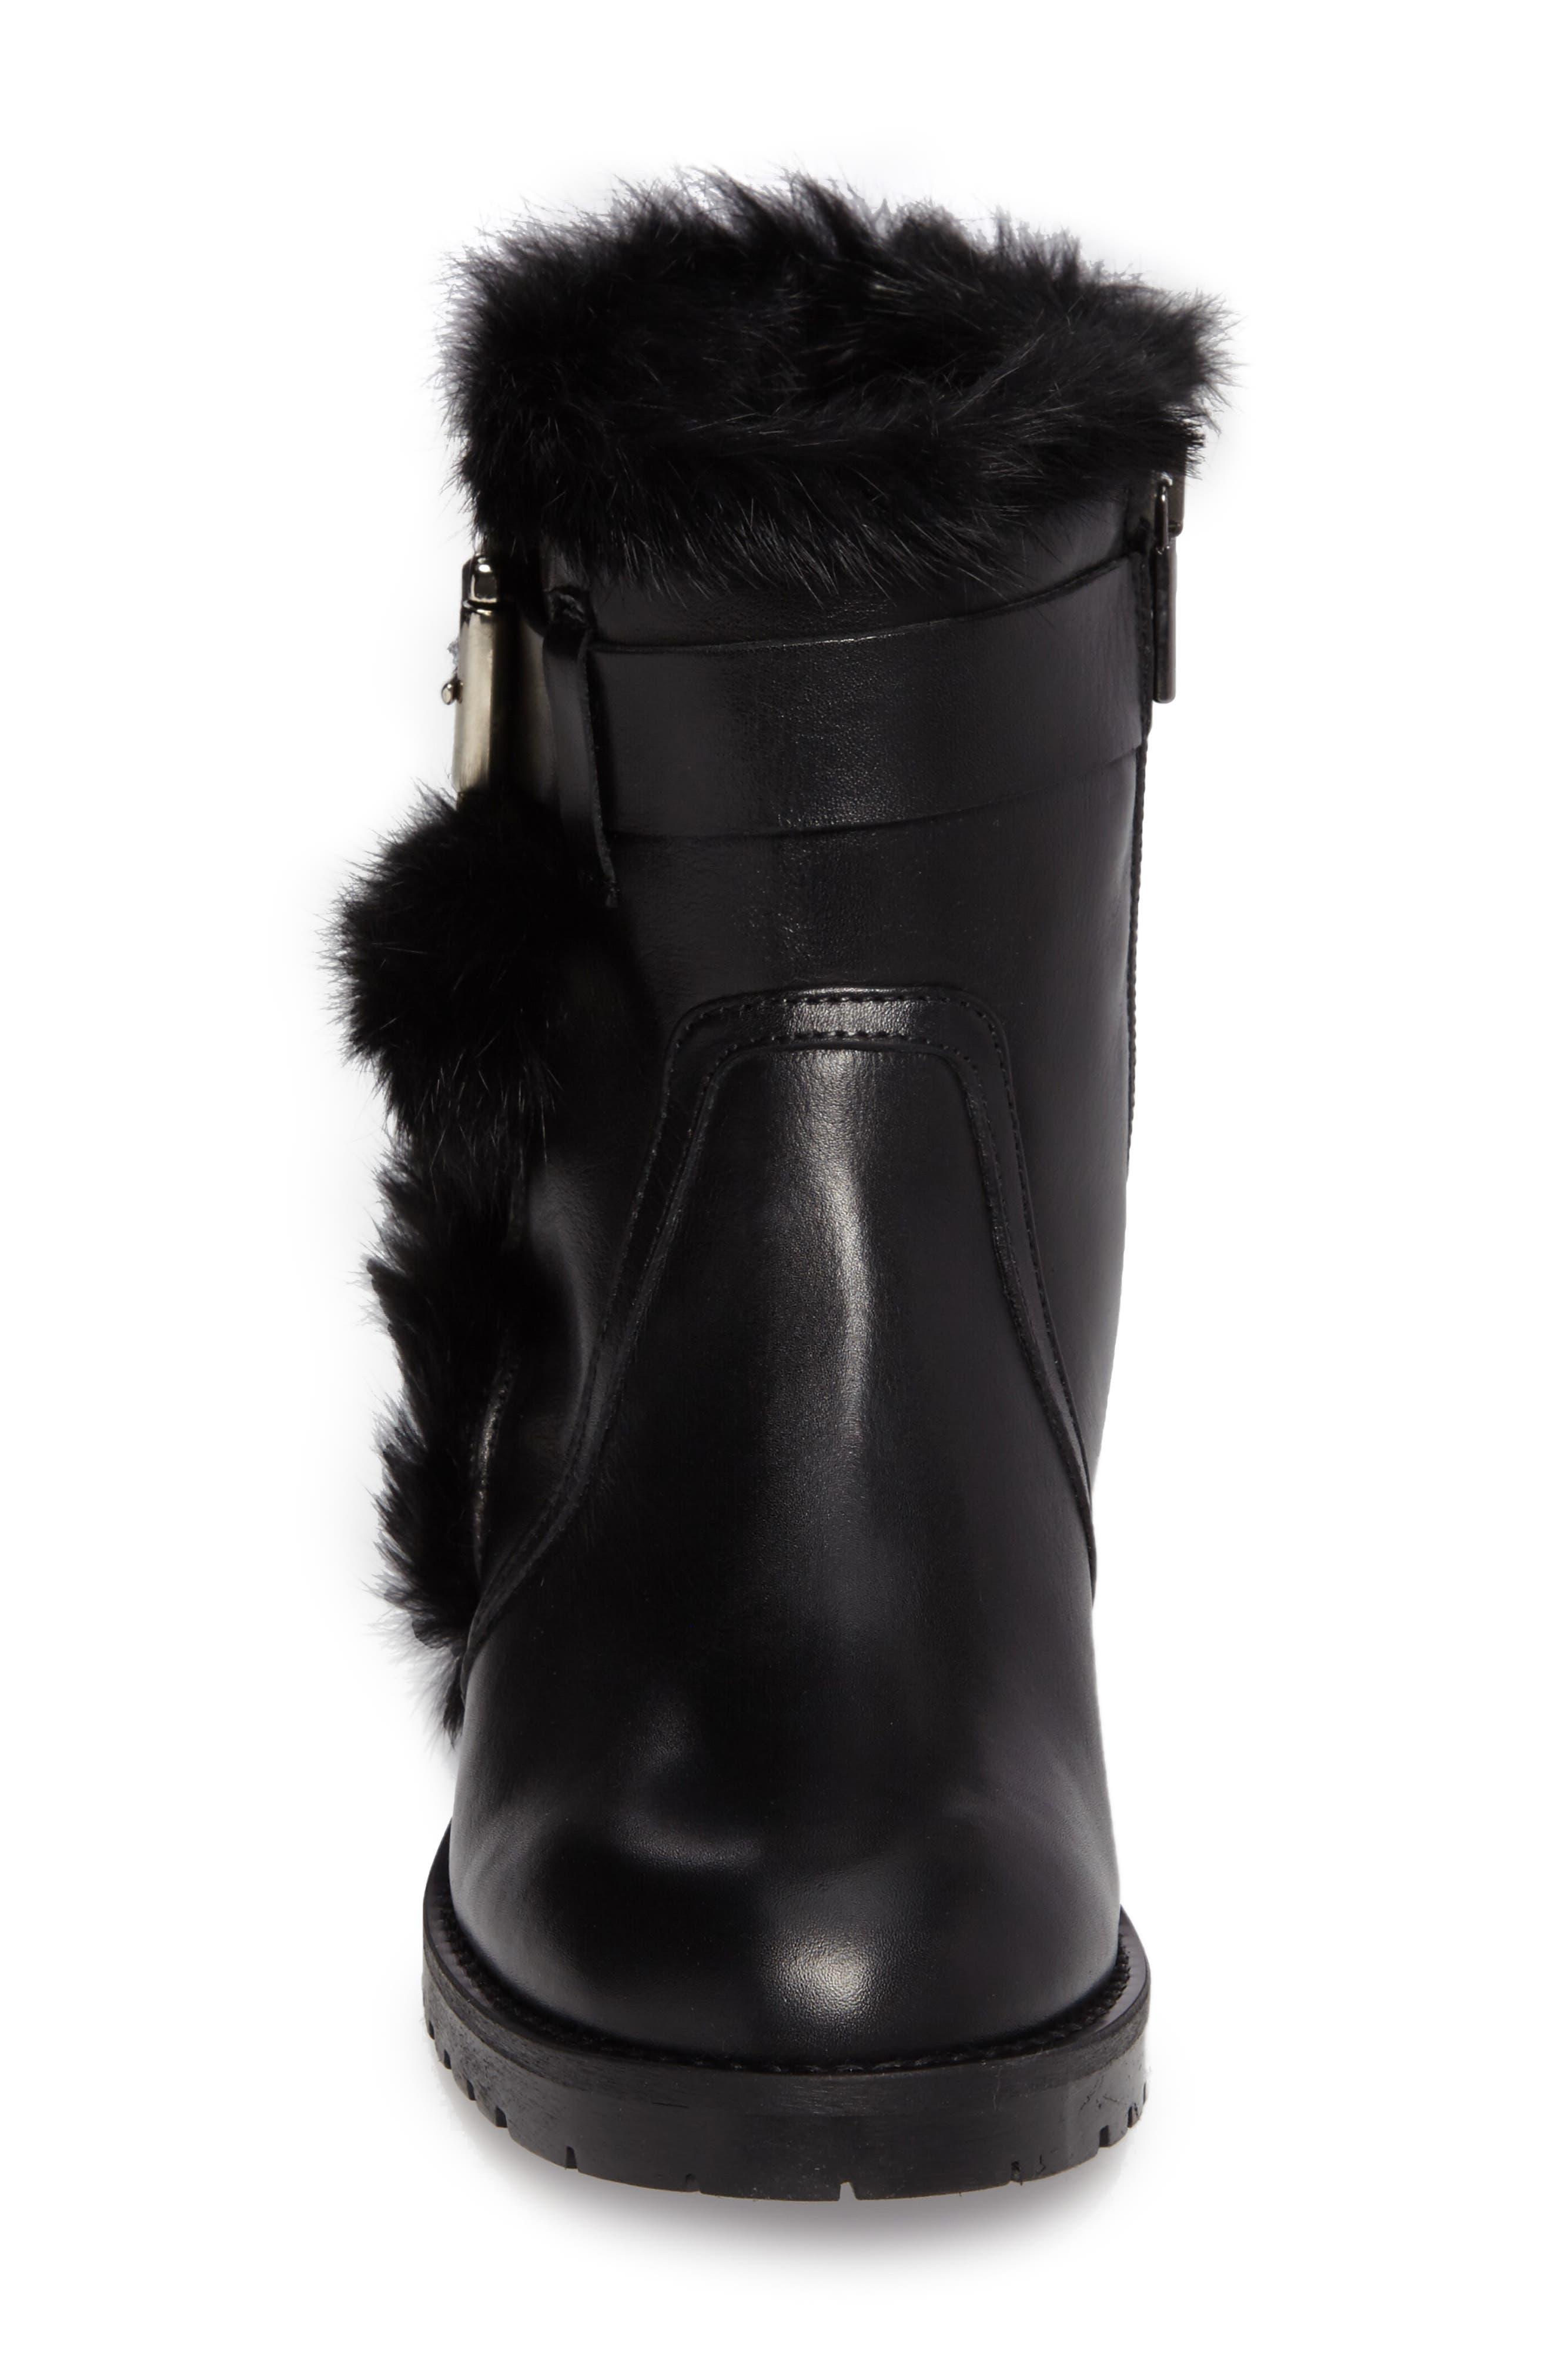 Rustic Genuine Rabbit Fur Cuff Boot,                             Alternate thumbnail 4, color,                             001